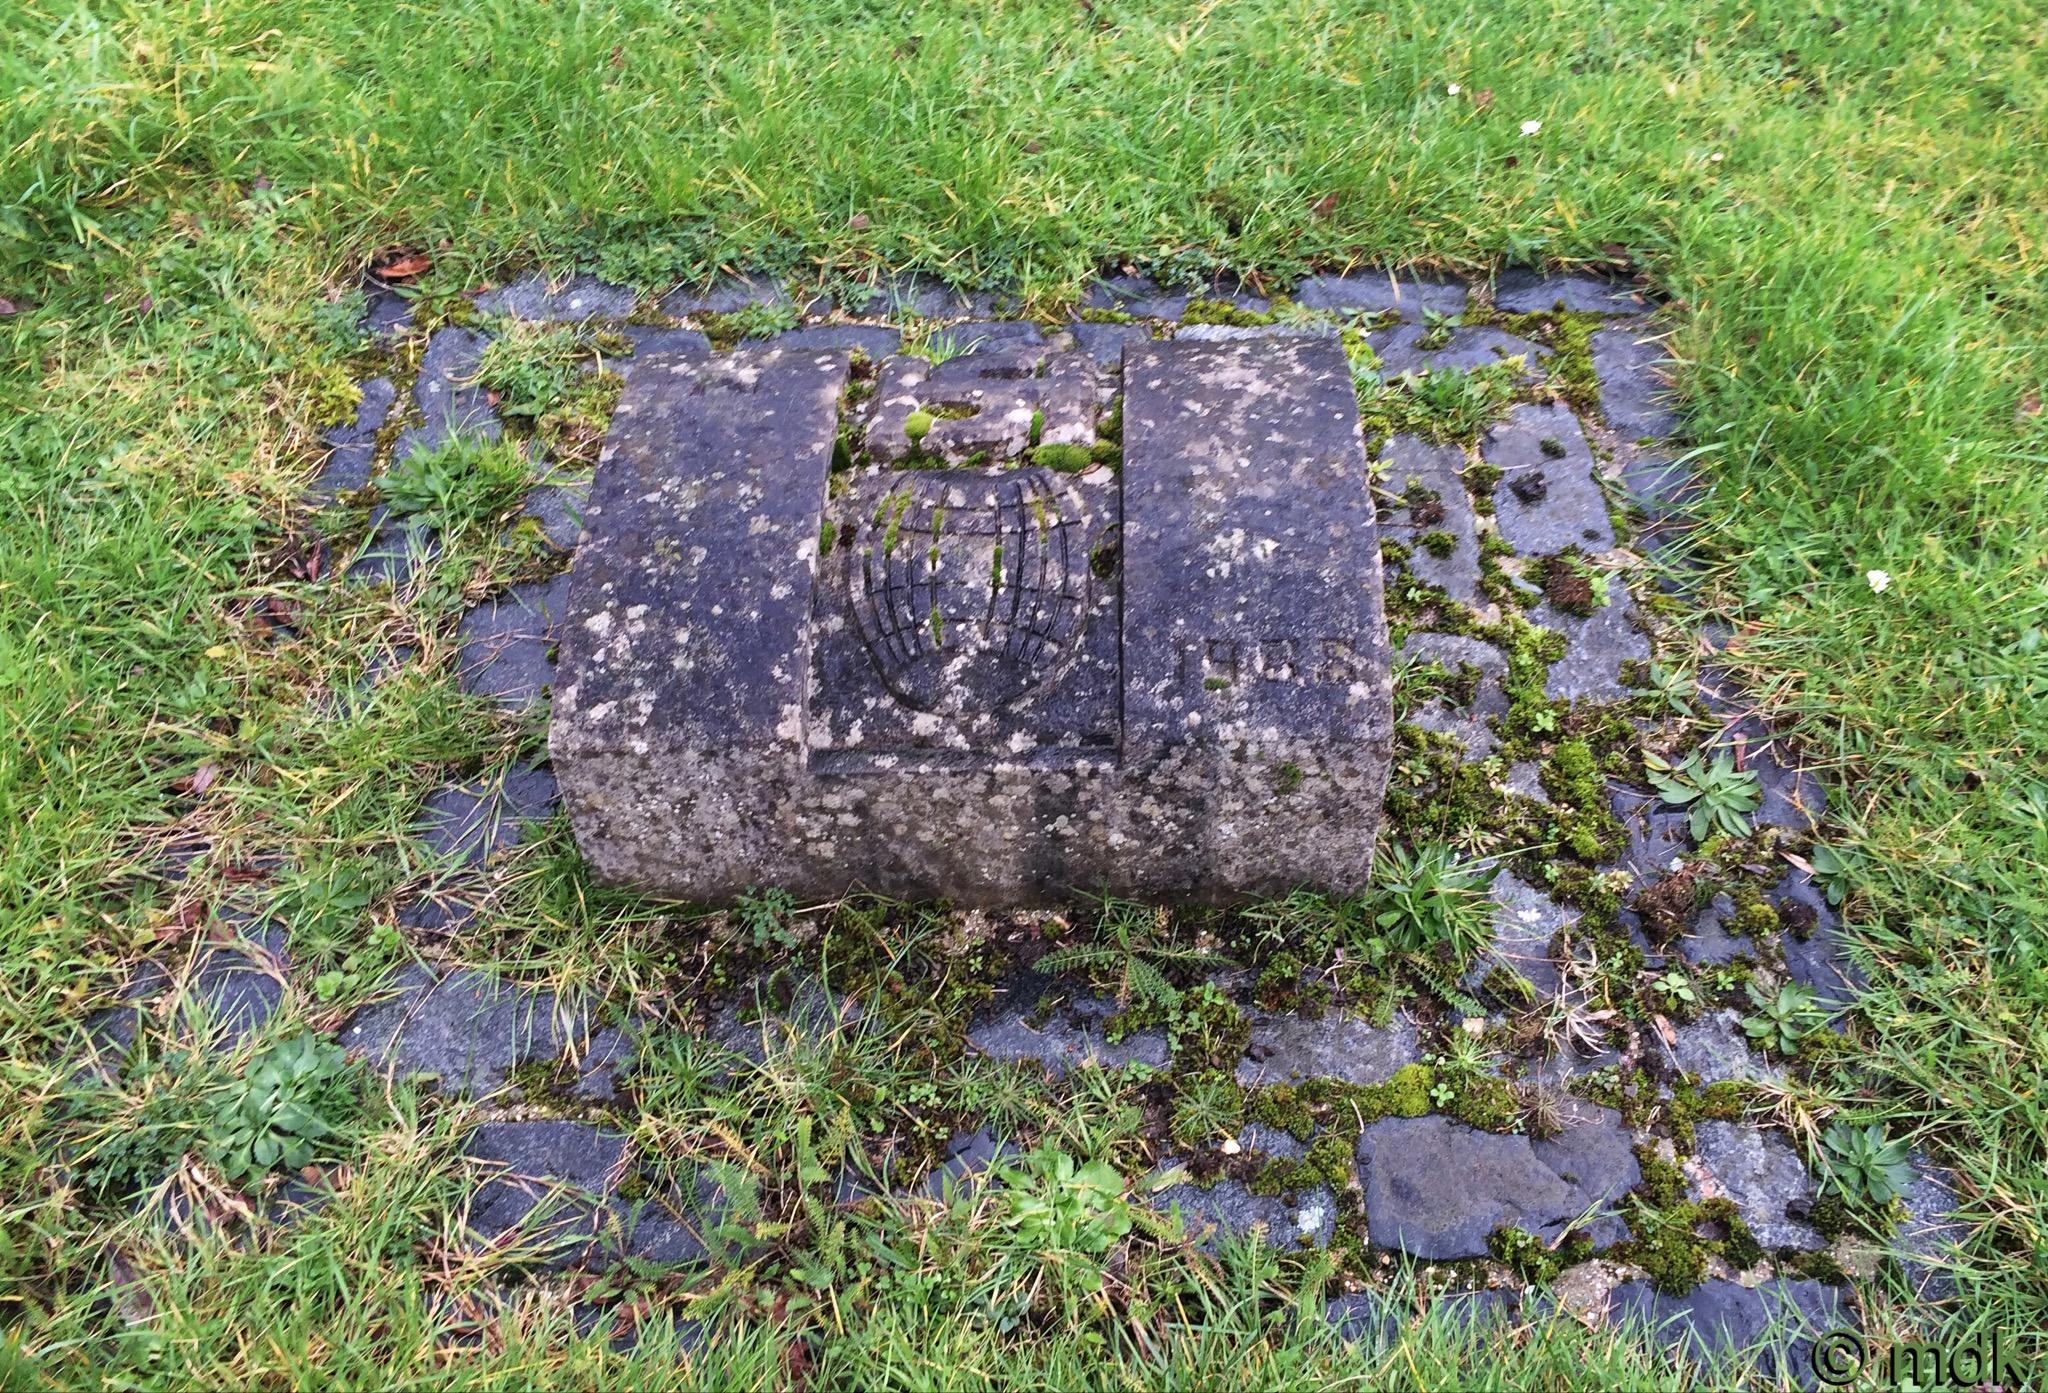 The Mansbridge Stone